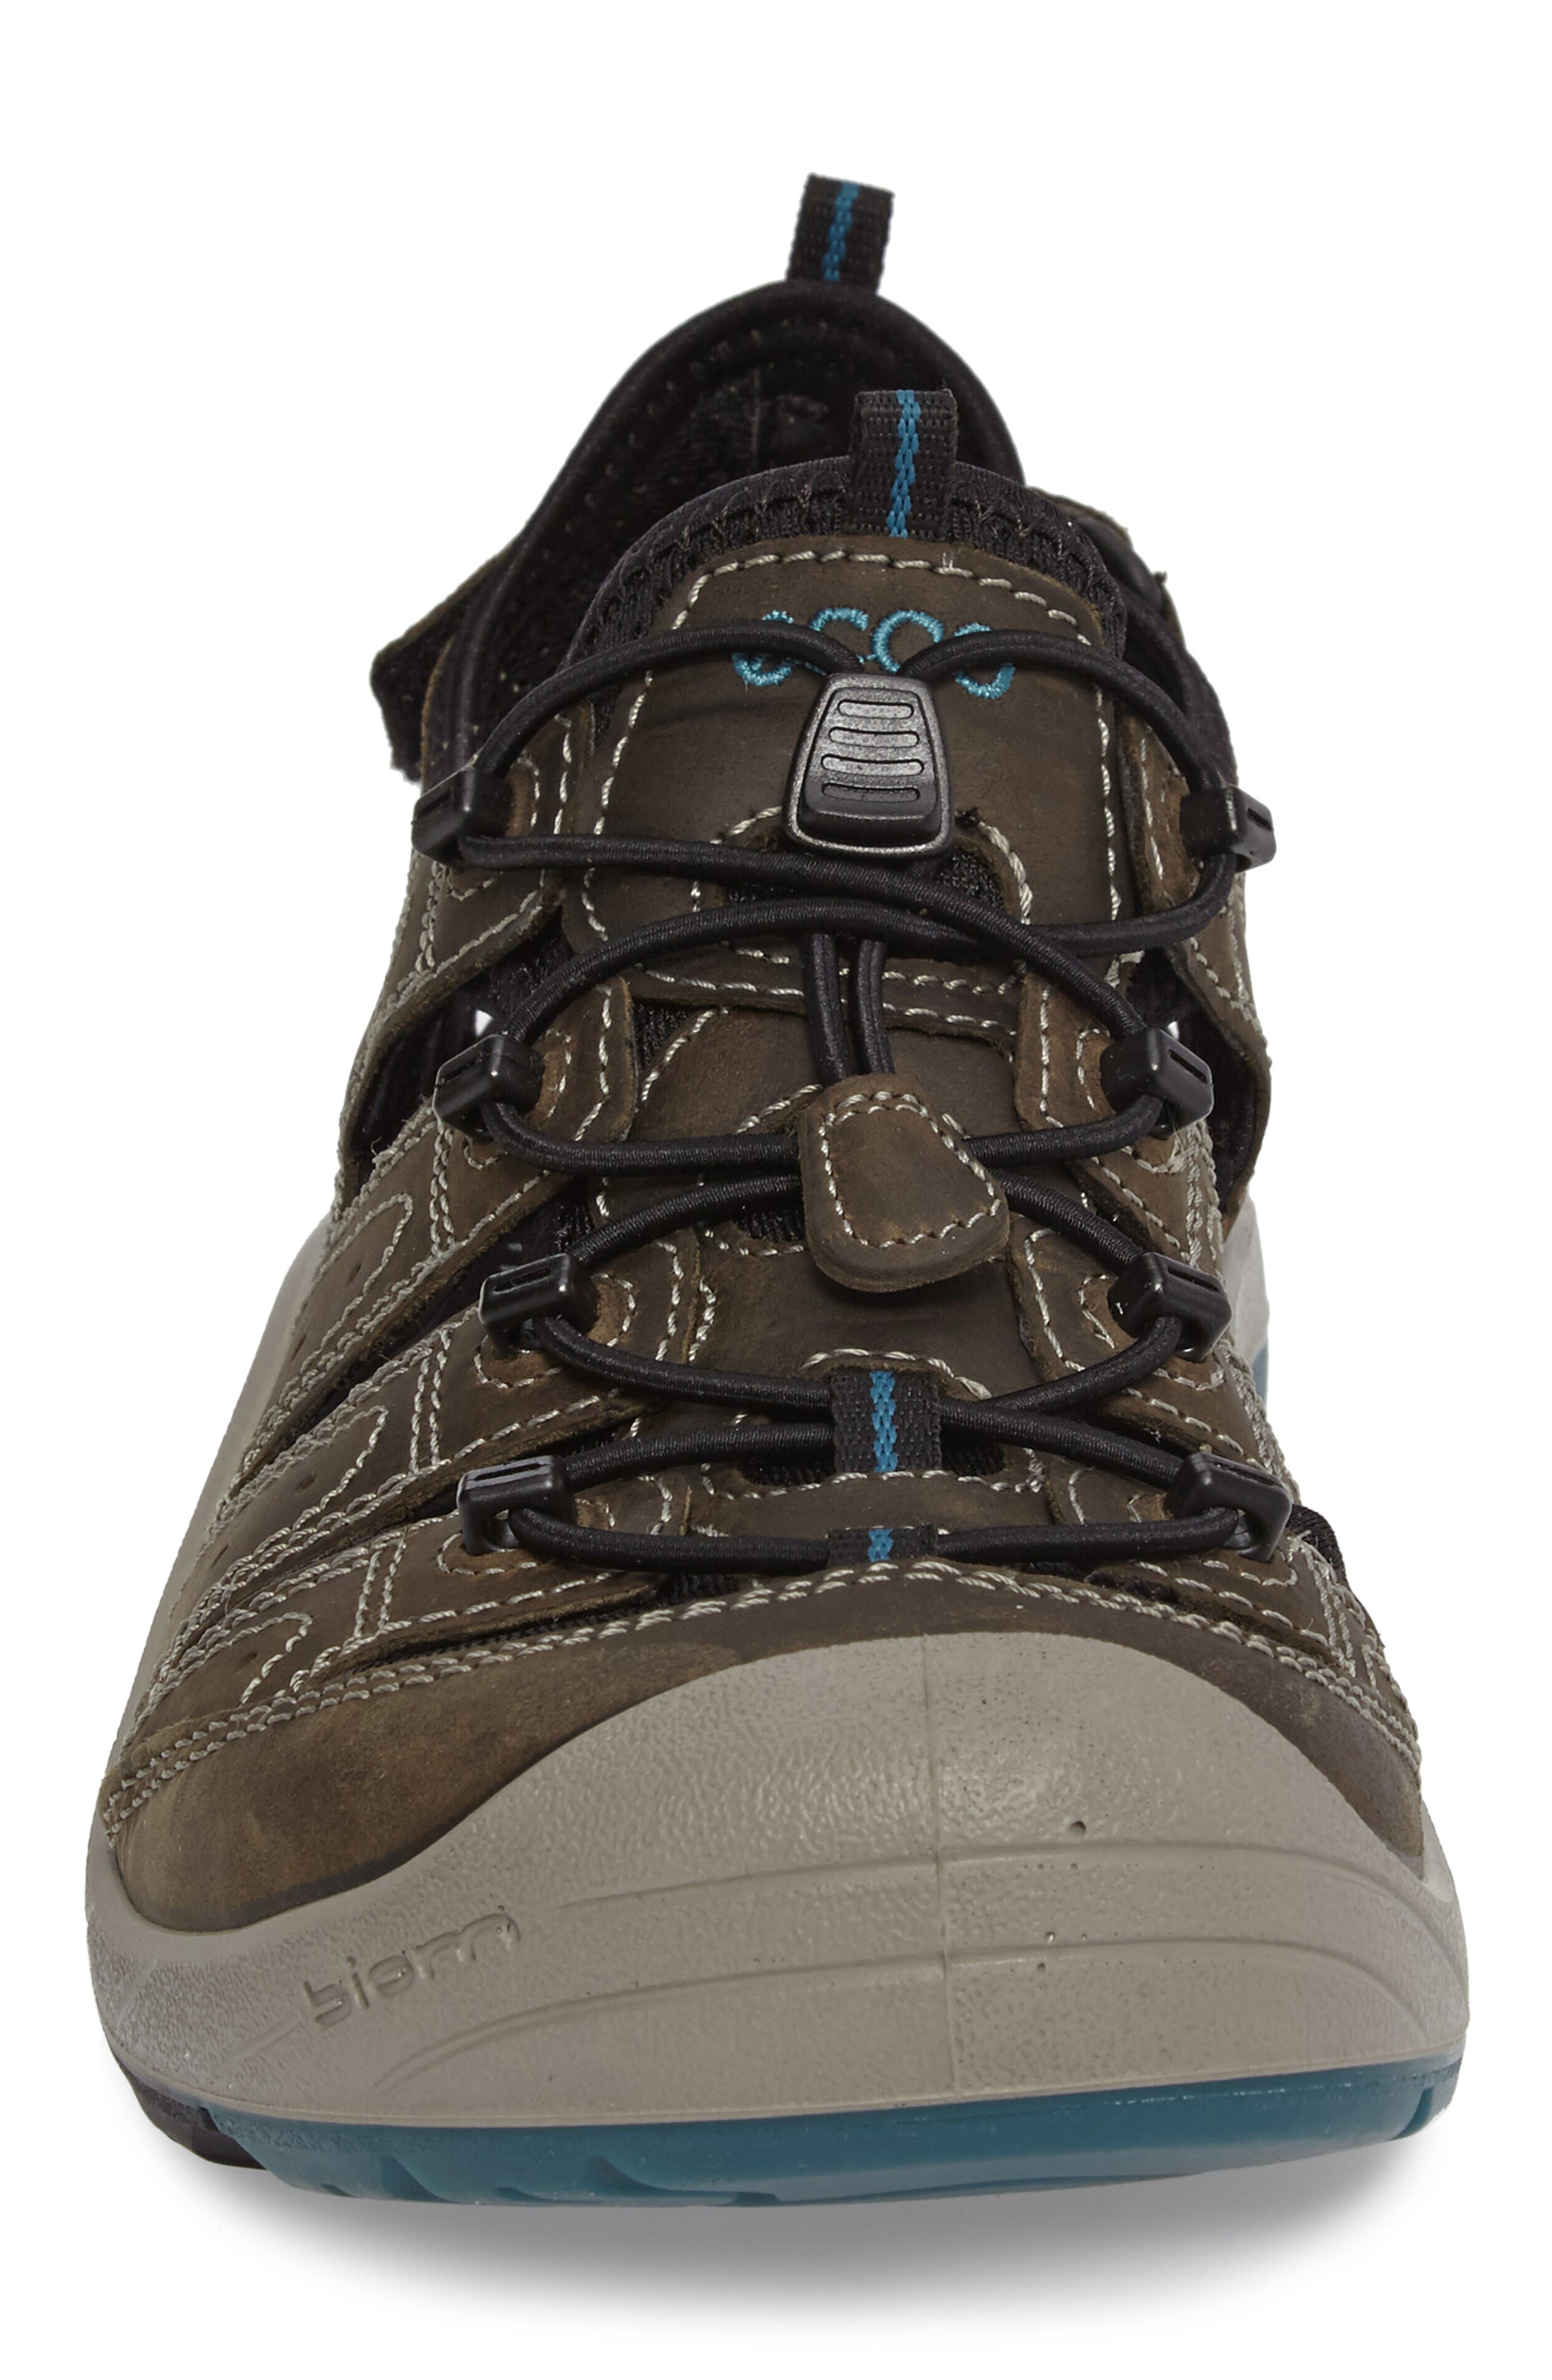 'BIOM Delta Offroad' Sandal,                             Alternate thumbnail 4, color,                             Tarmac/ Black